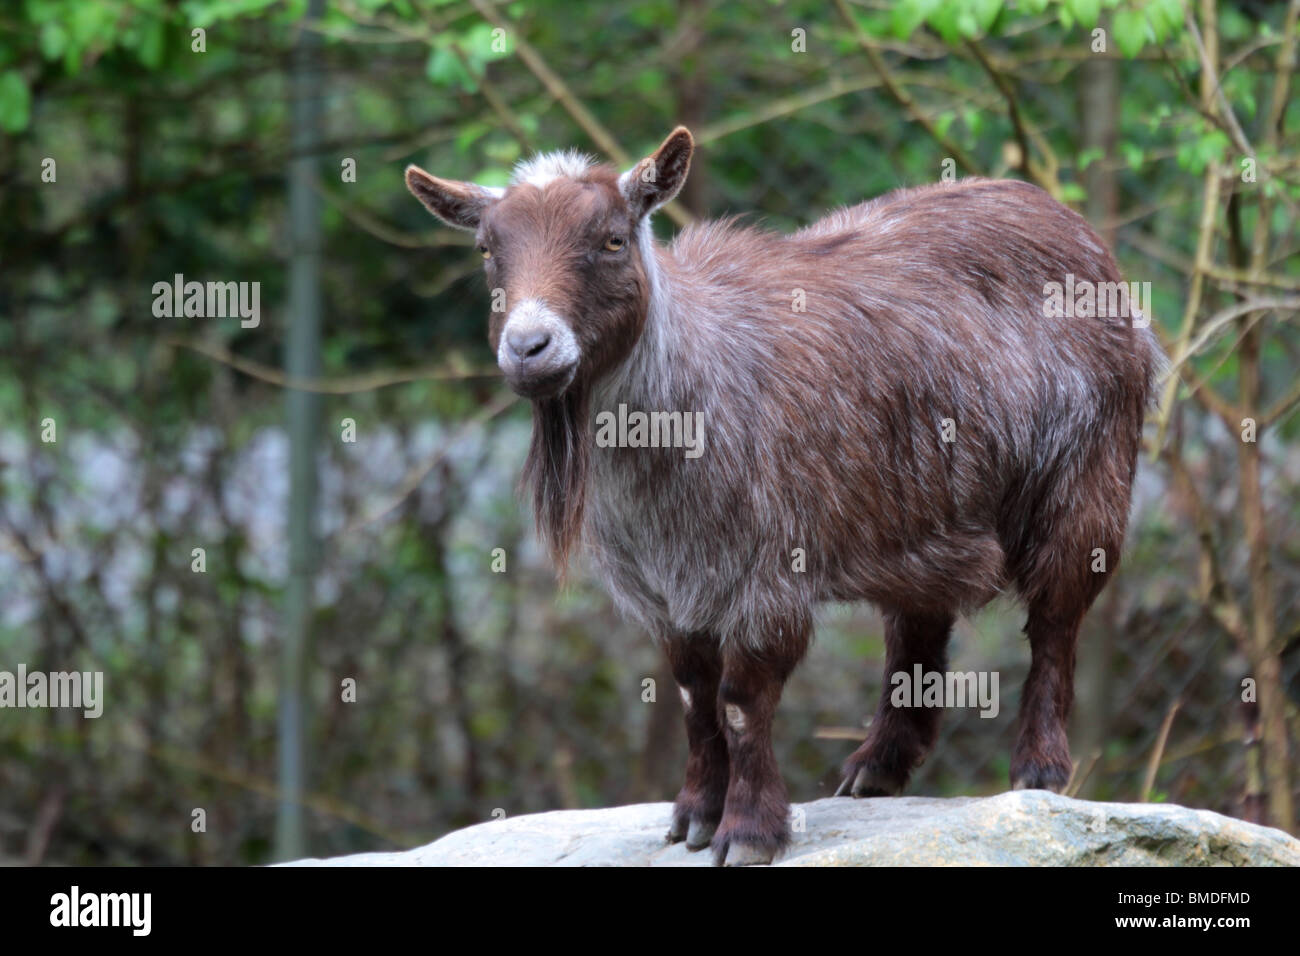 female pygmy goat on a rock - Stock Image